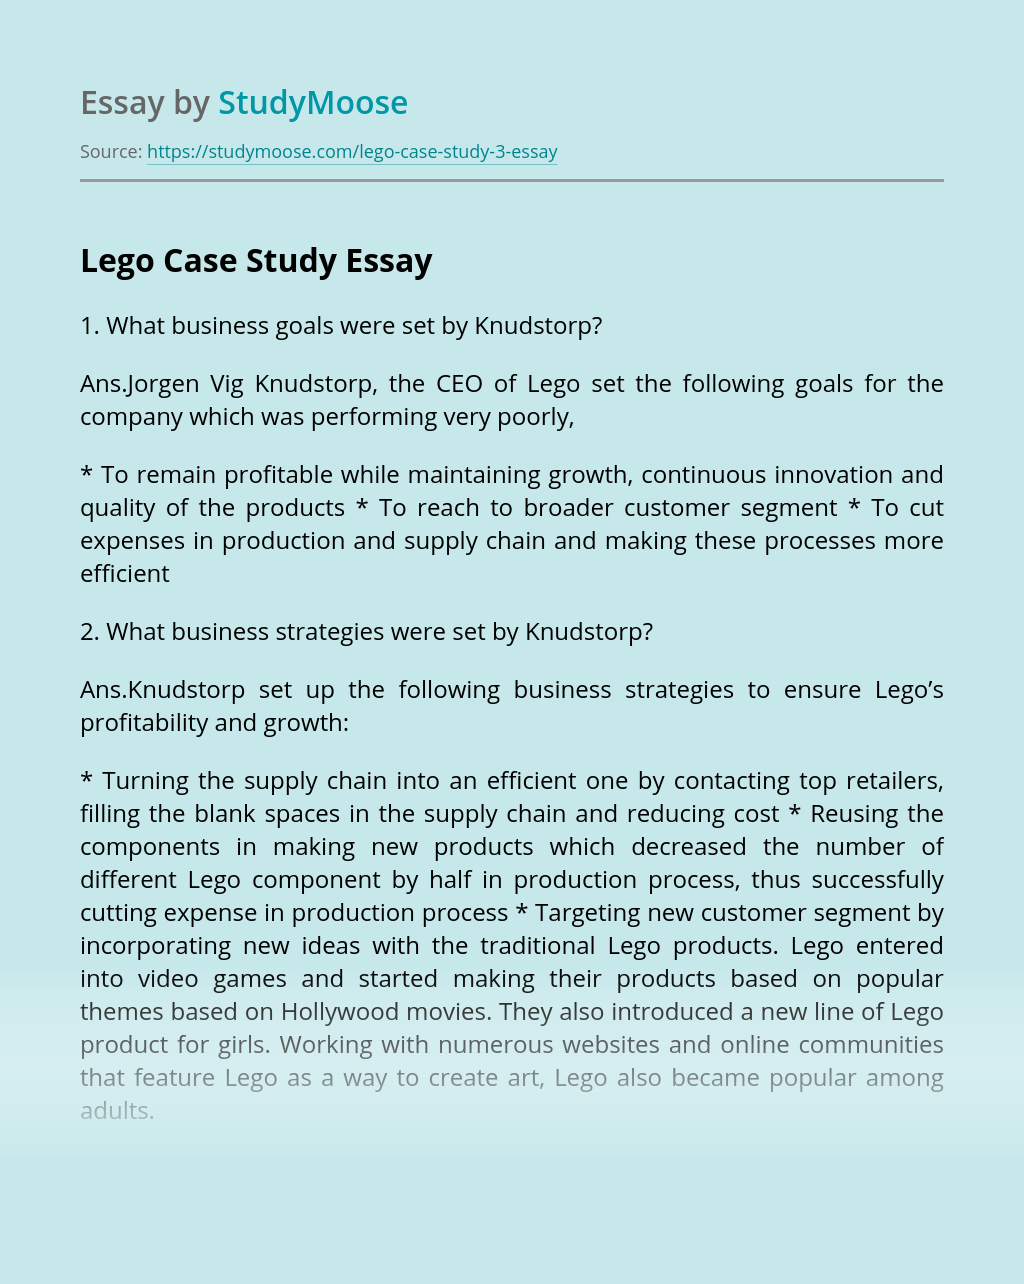 Knudstorp's business strategies of Lego